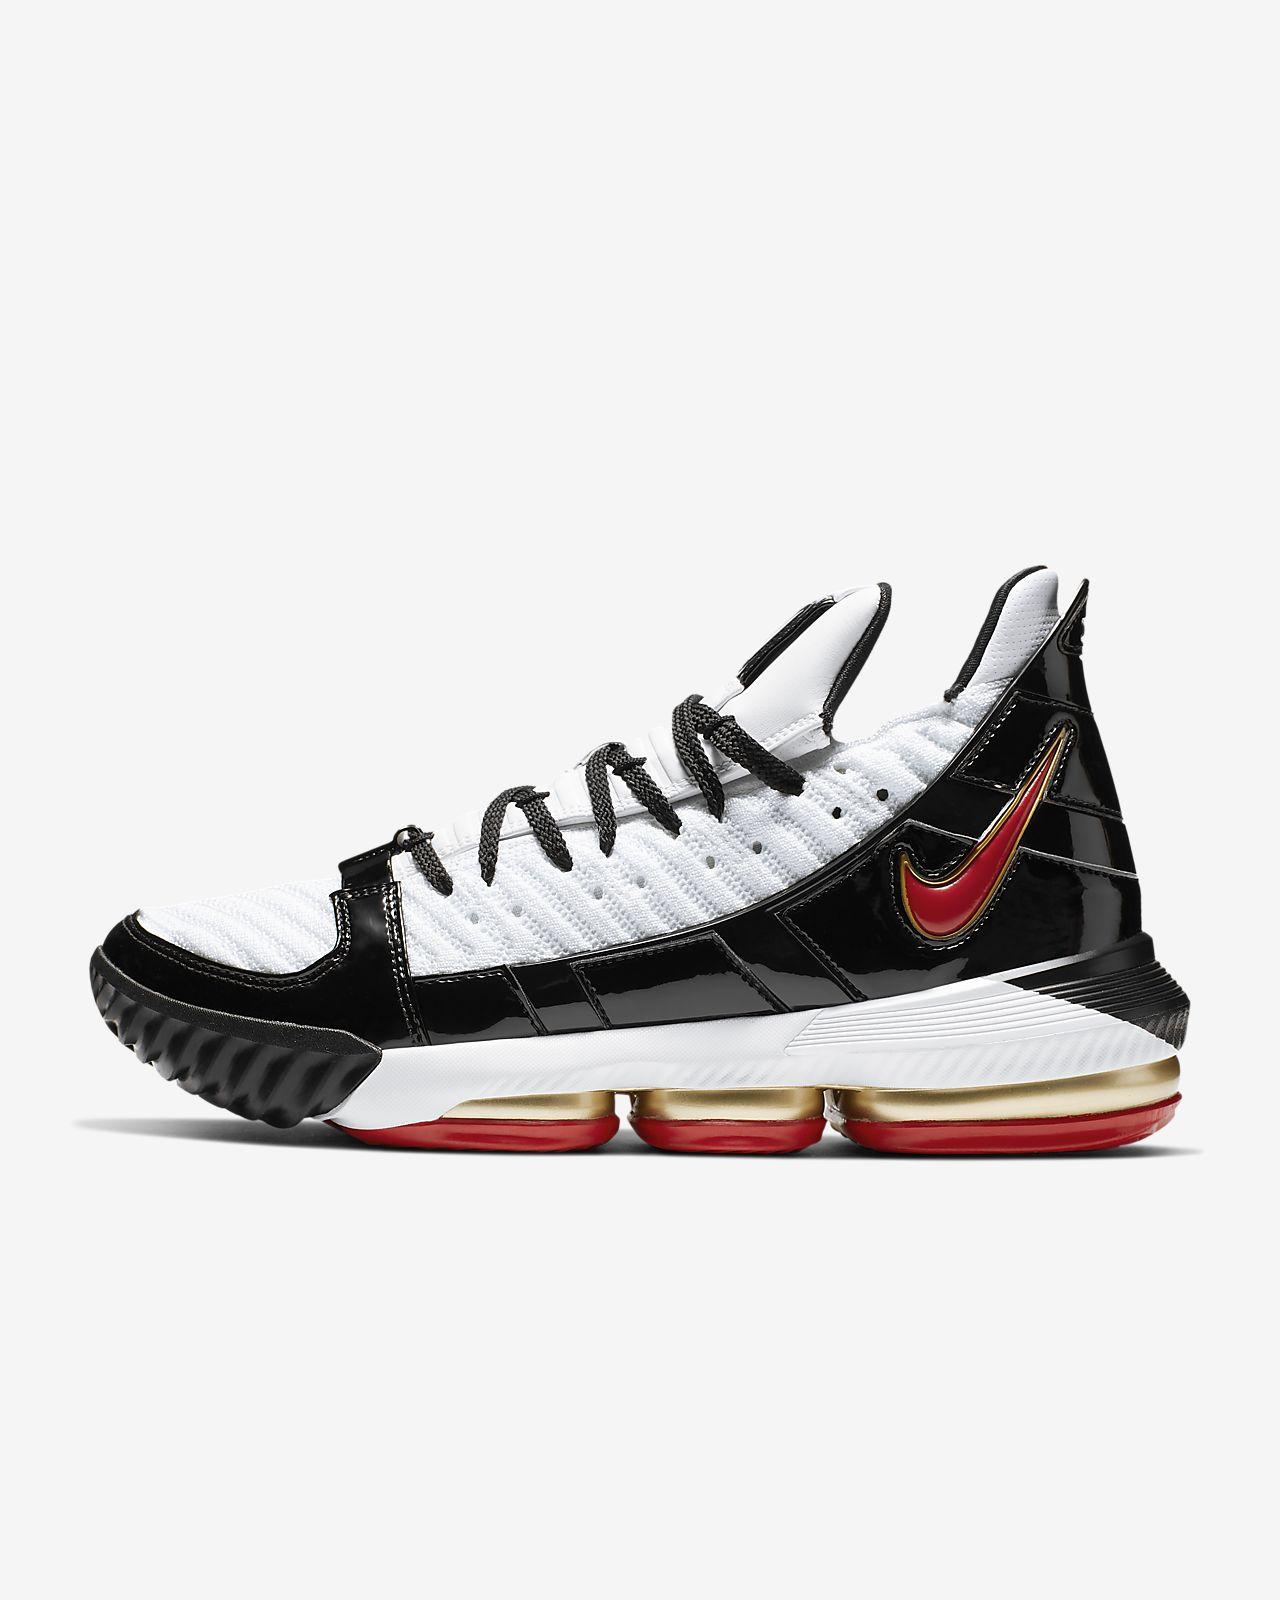 the best attitude 46f90 320ac Basketball Shoe. LeBron 16 SB Remix